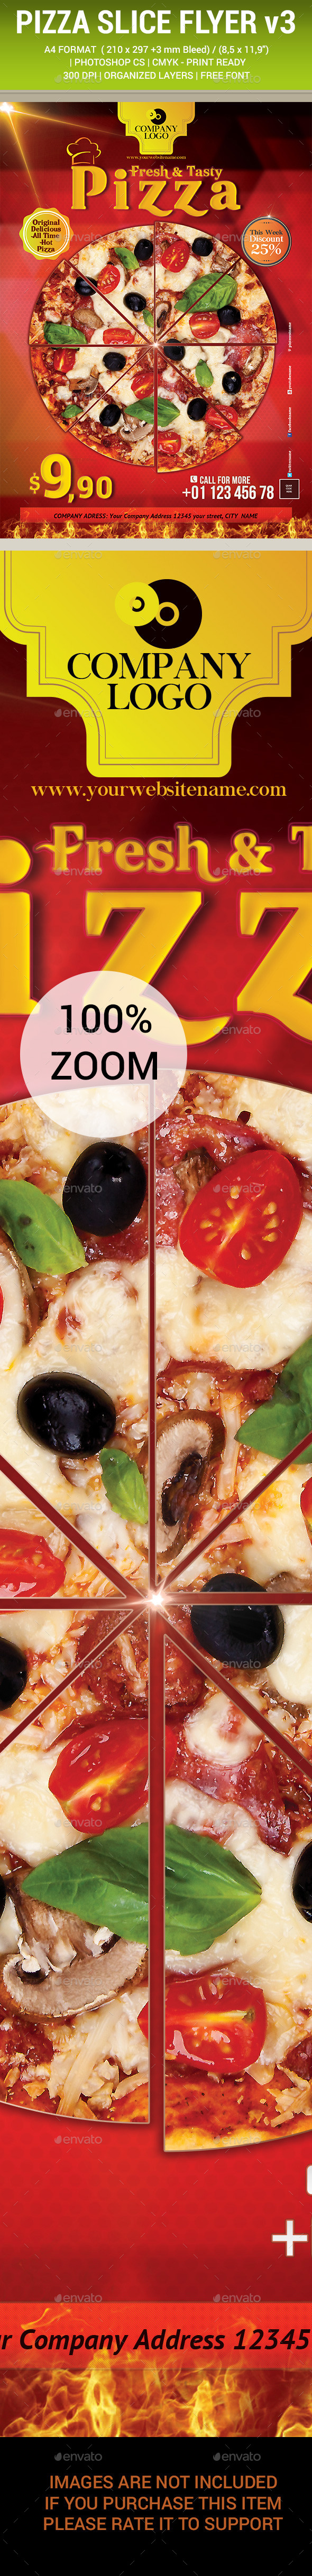 Pizza Slice Flyer v3 - Restaurant Flyers